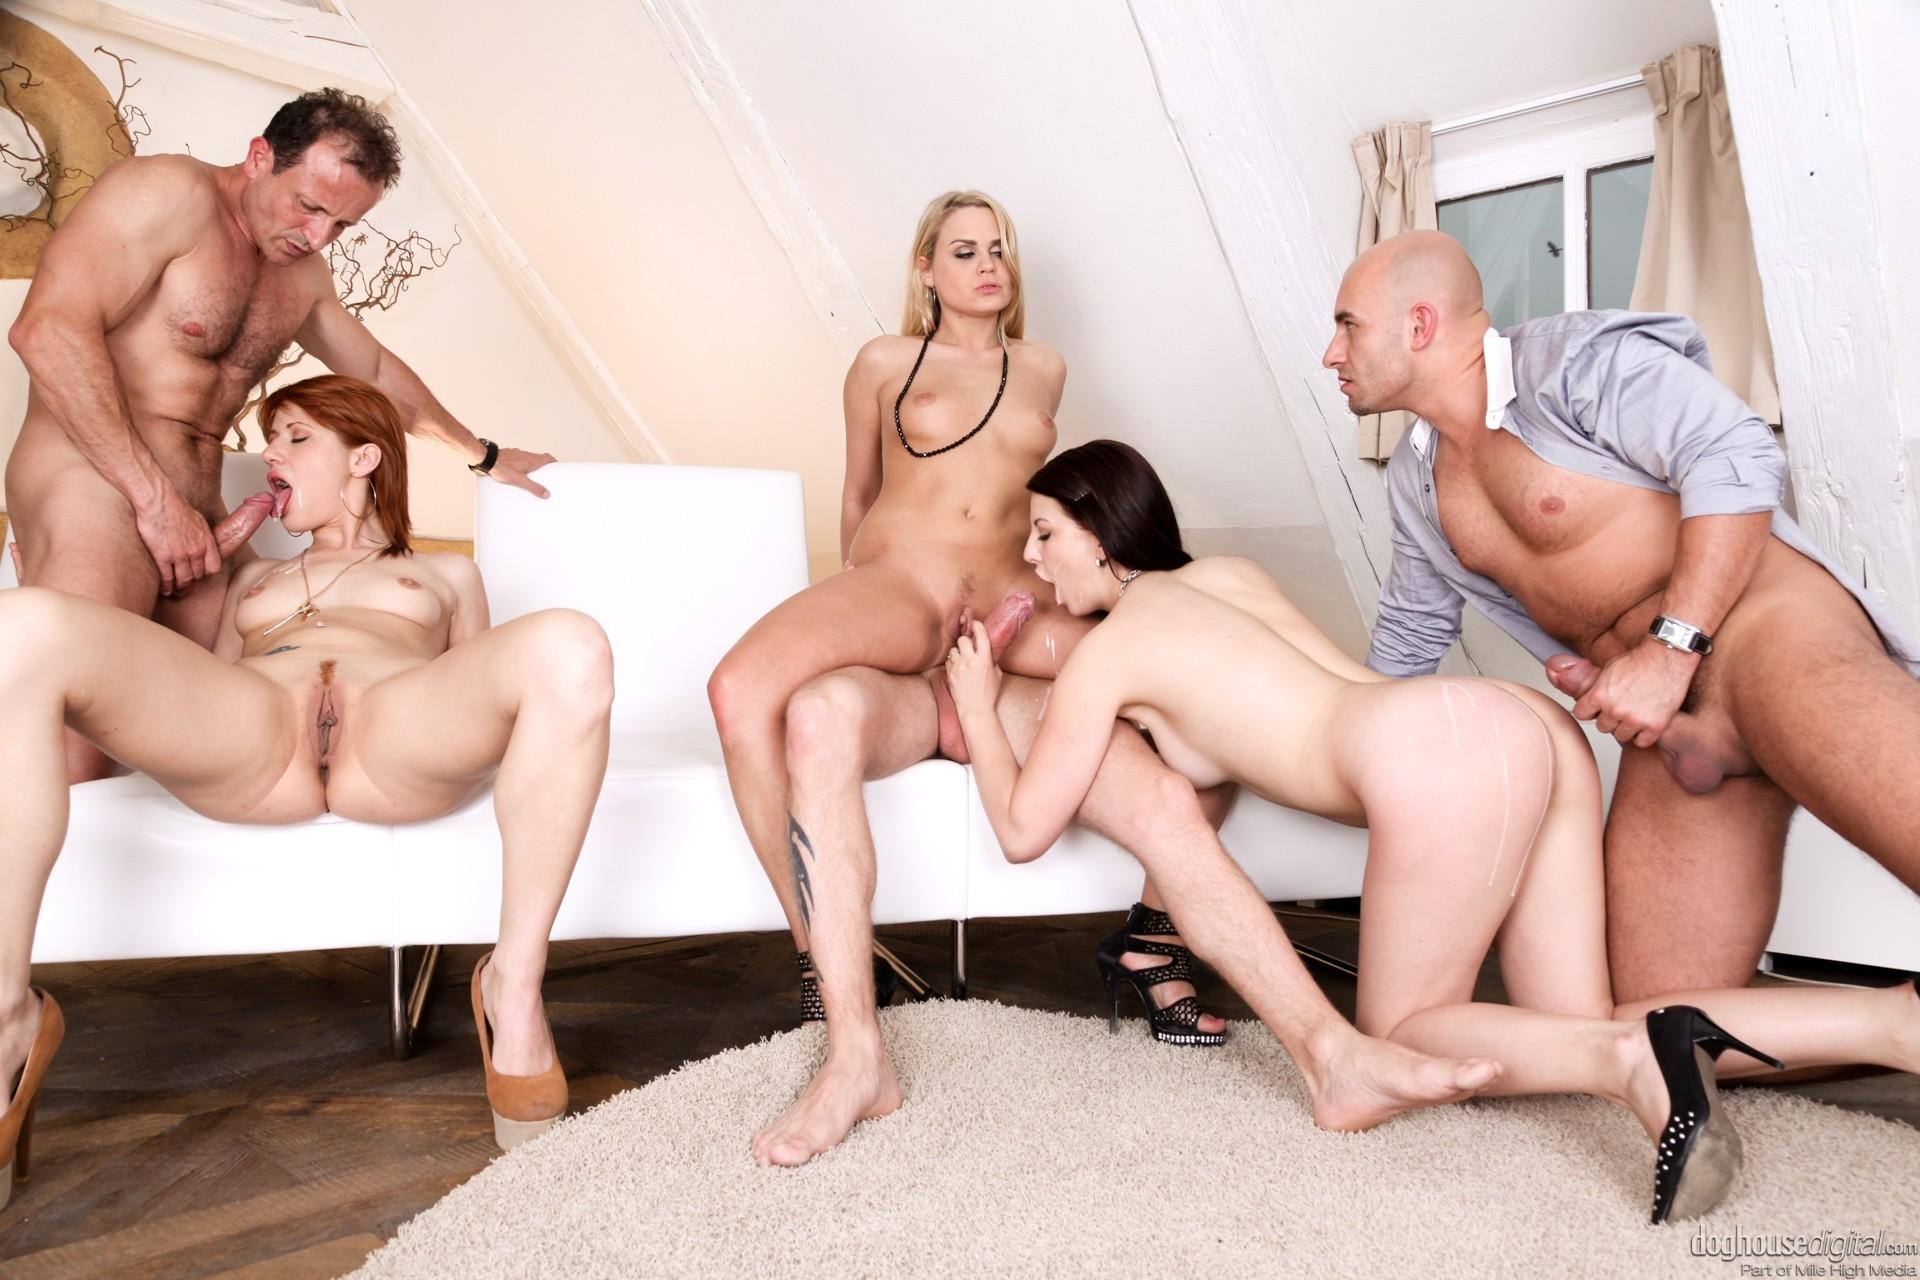 Group porn sex story